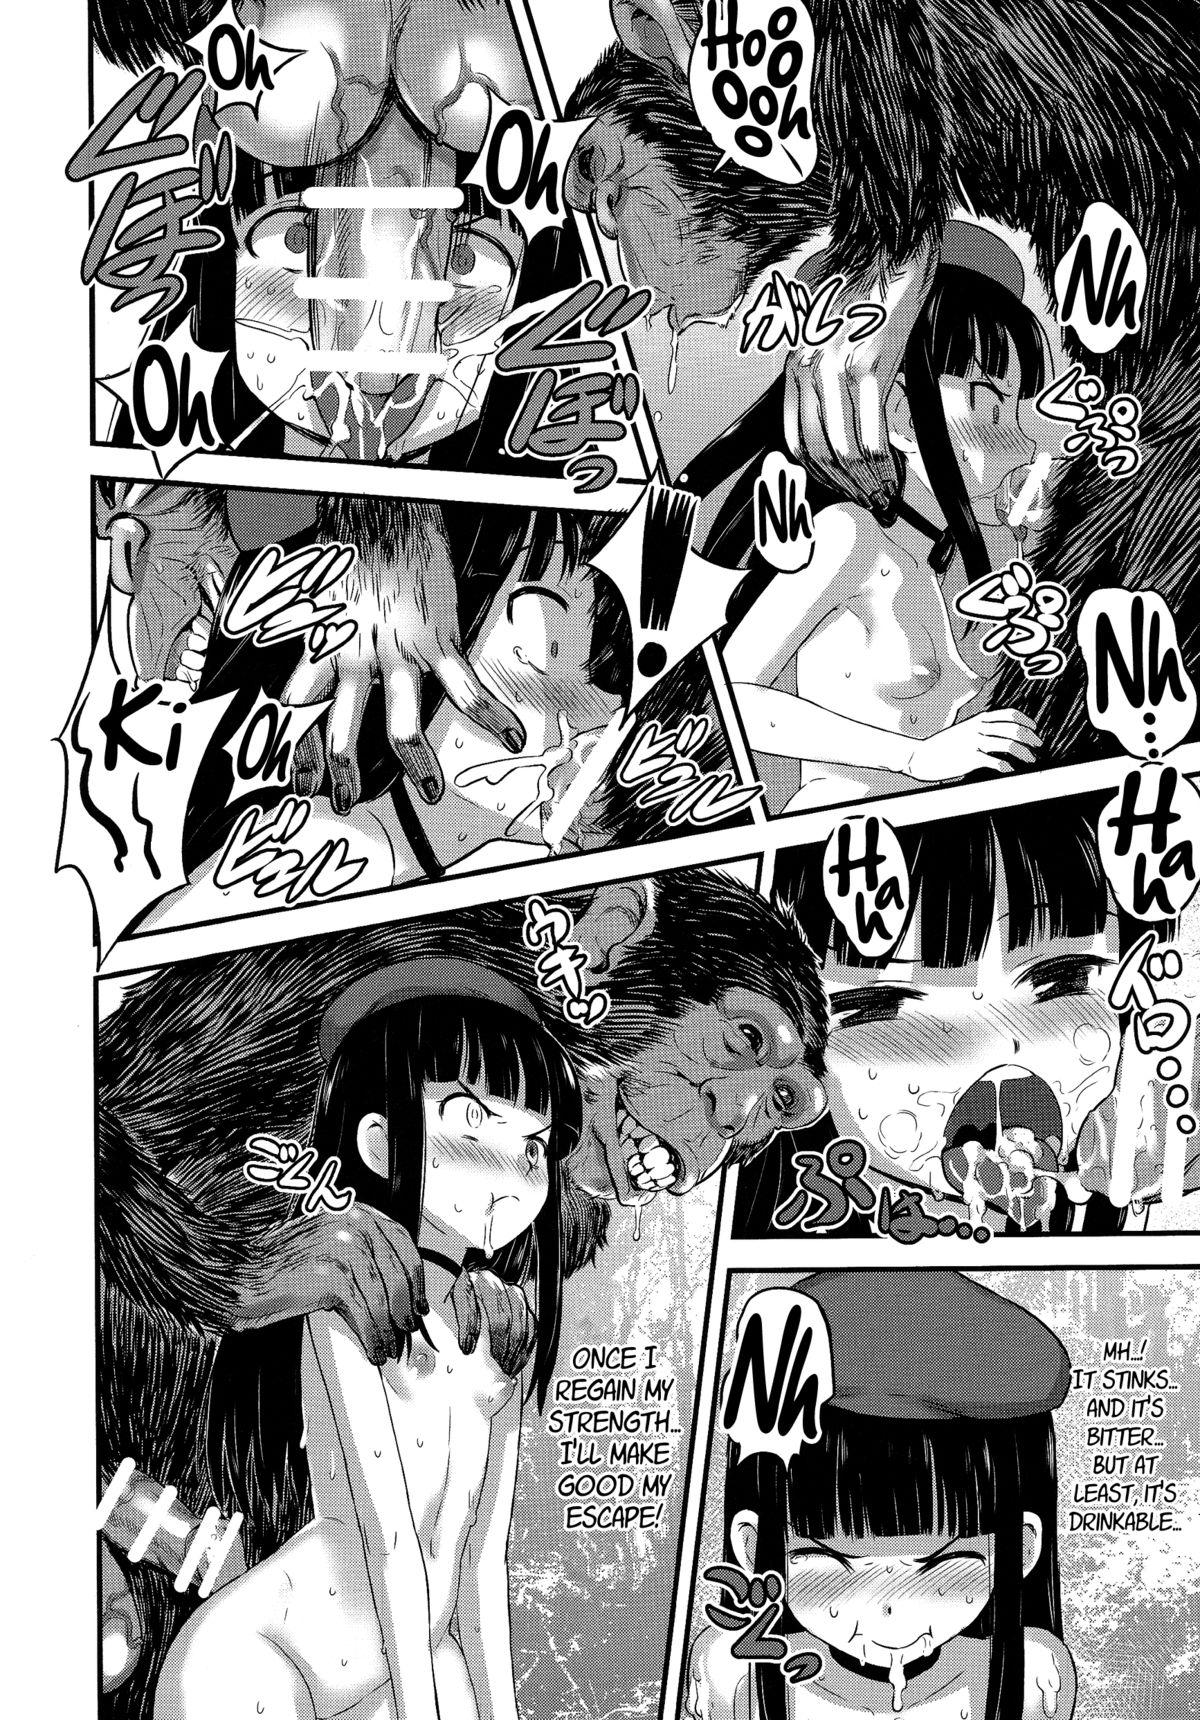 Hadakahime Honoka 2 Misemono Tanetsuke Saru Koubi | Naked Princess Honoka 2 - Mating Exhibition: Monkey Coitus 12